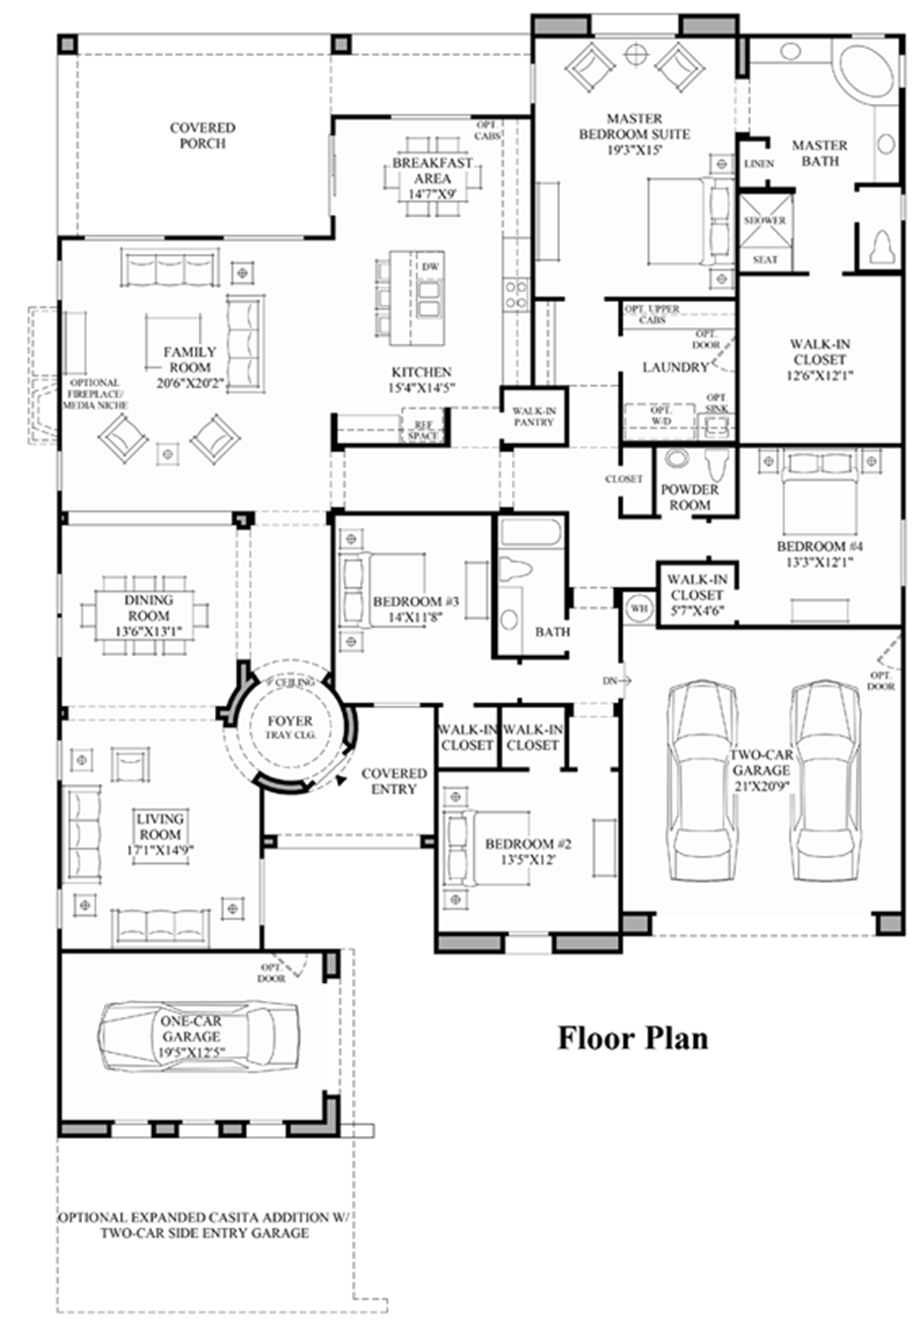 Toll brothers at blackstone the santiago az home design for Arizona floor plans